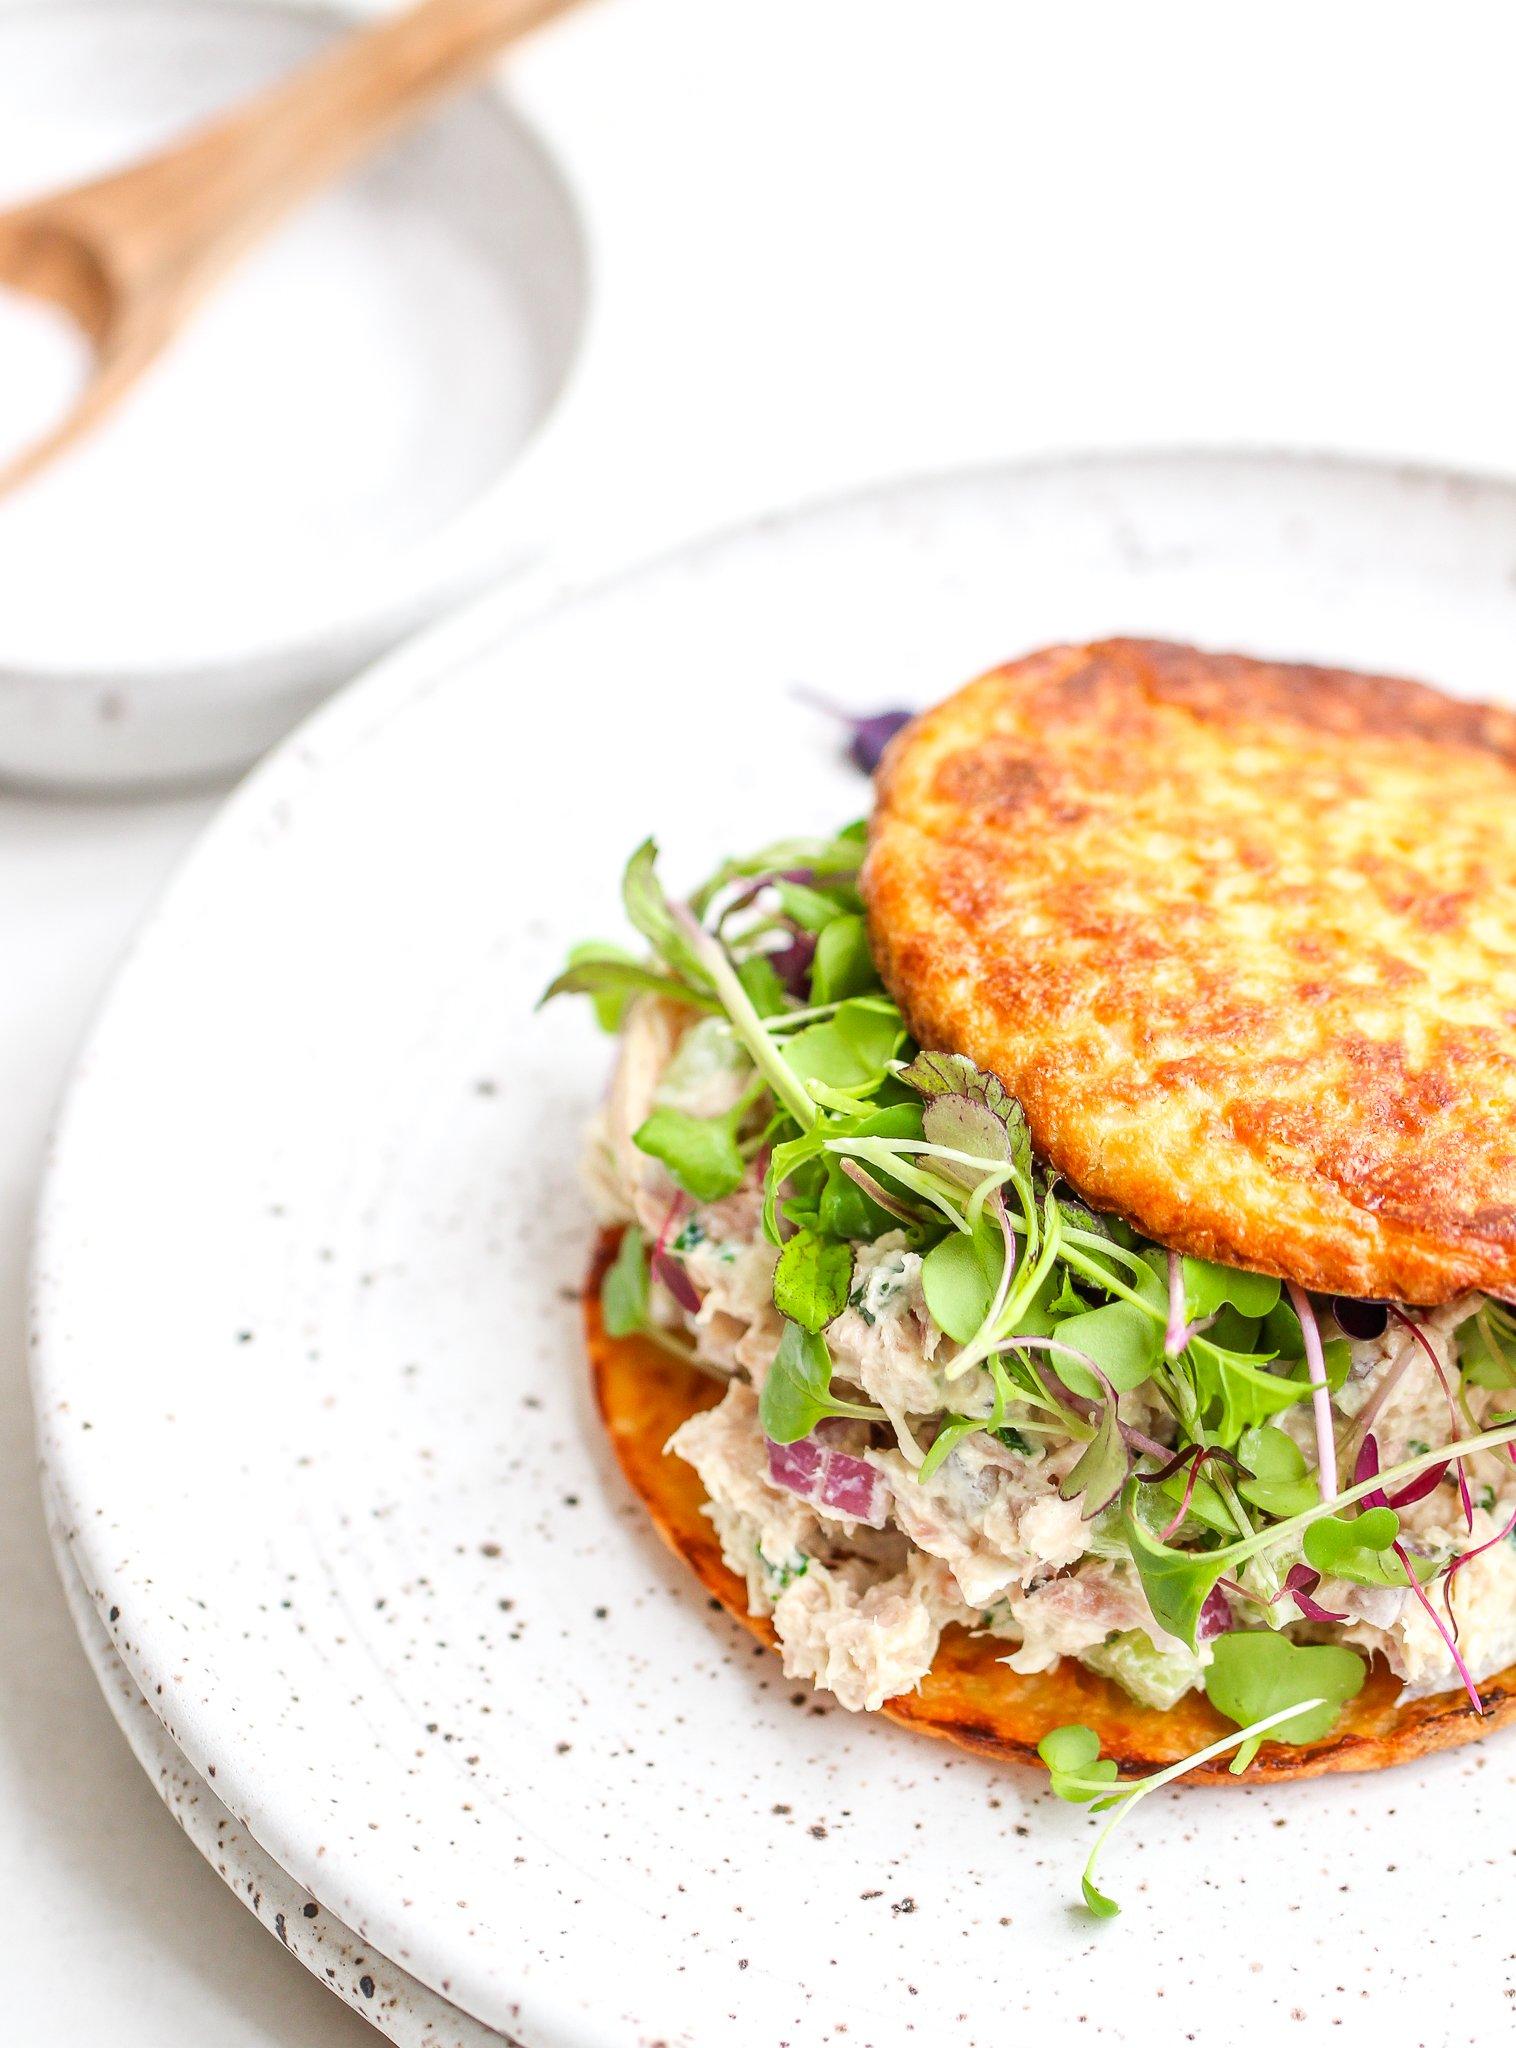 low carb tuna salad sandwich on toasted cauliflower thins with fresh micro greens